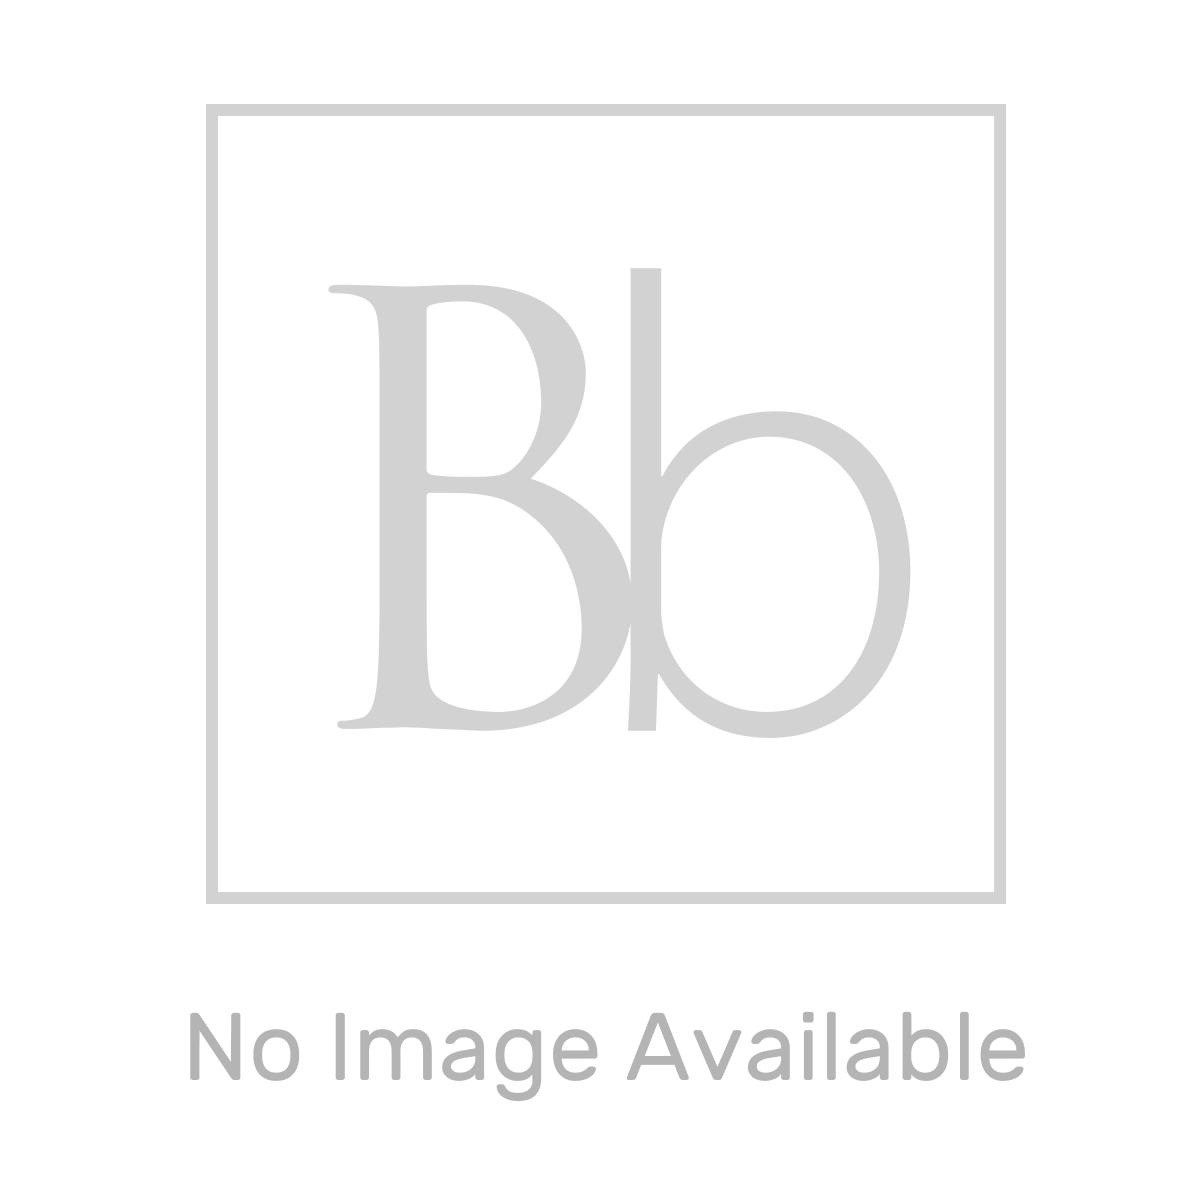 Stuart Turner 46553 CH 4-30 Centrifugal Multistage 2.5 Bar Pump Left